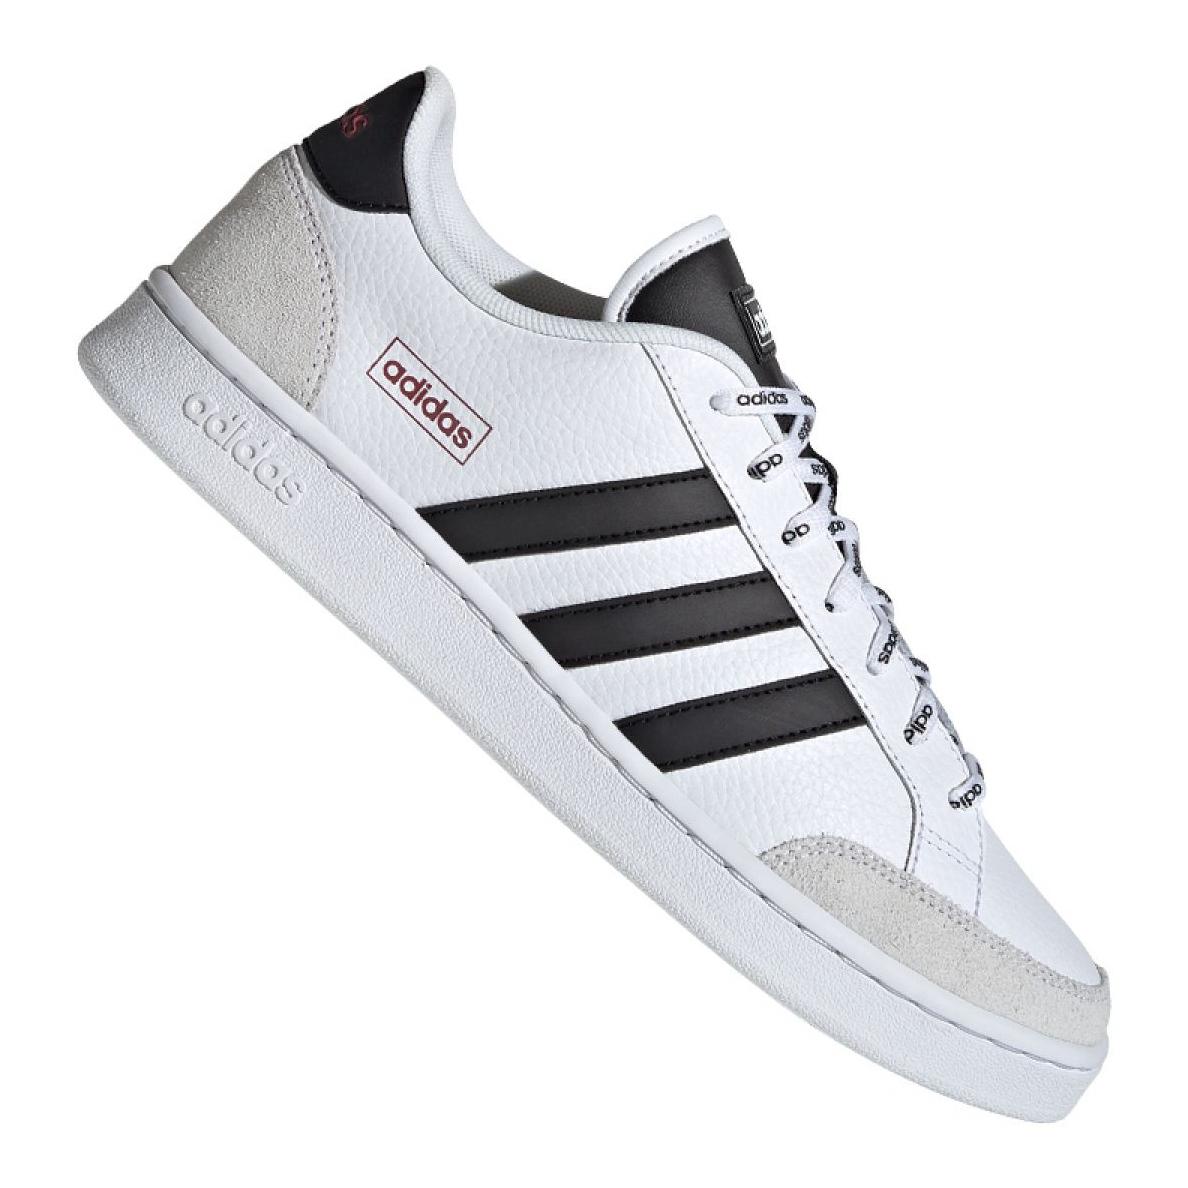 Adidas Grand Court Se M FW6669 shoes white black